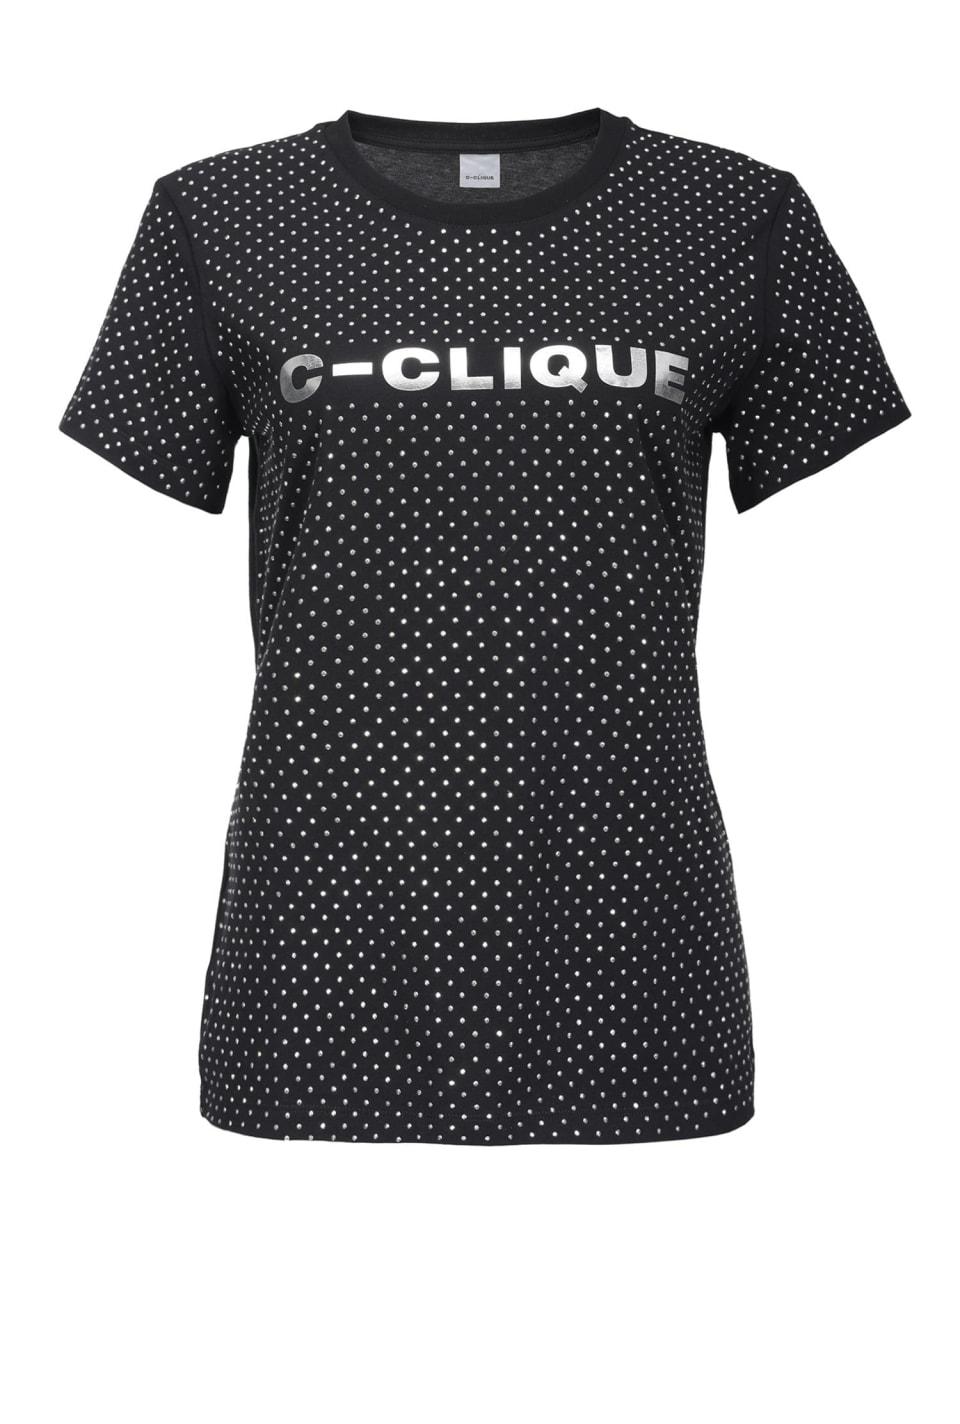 Camiseta con microtachas